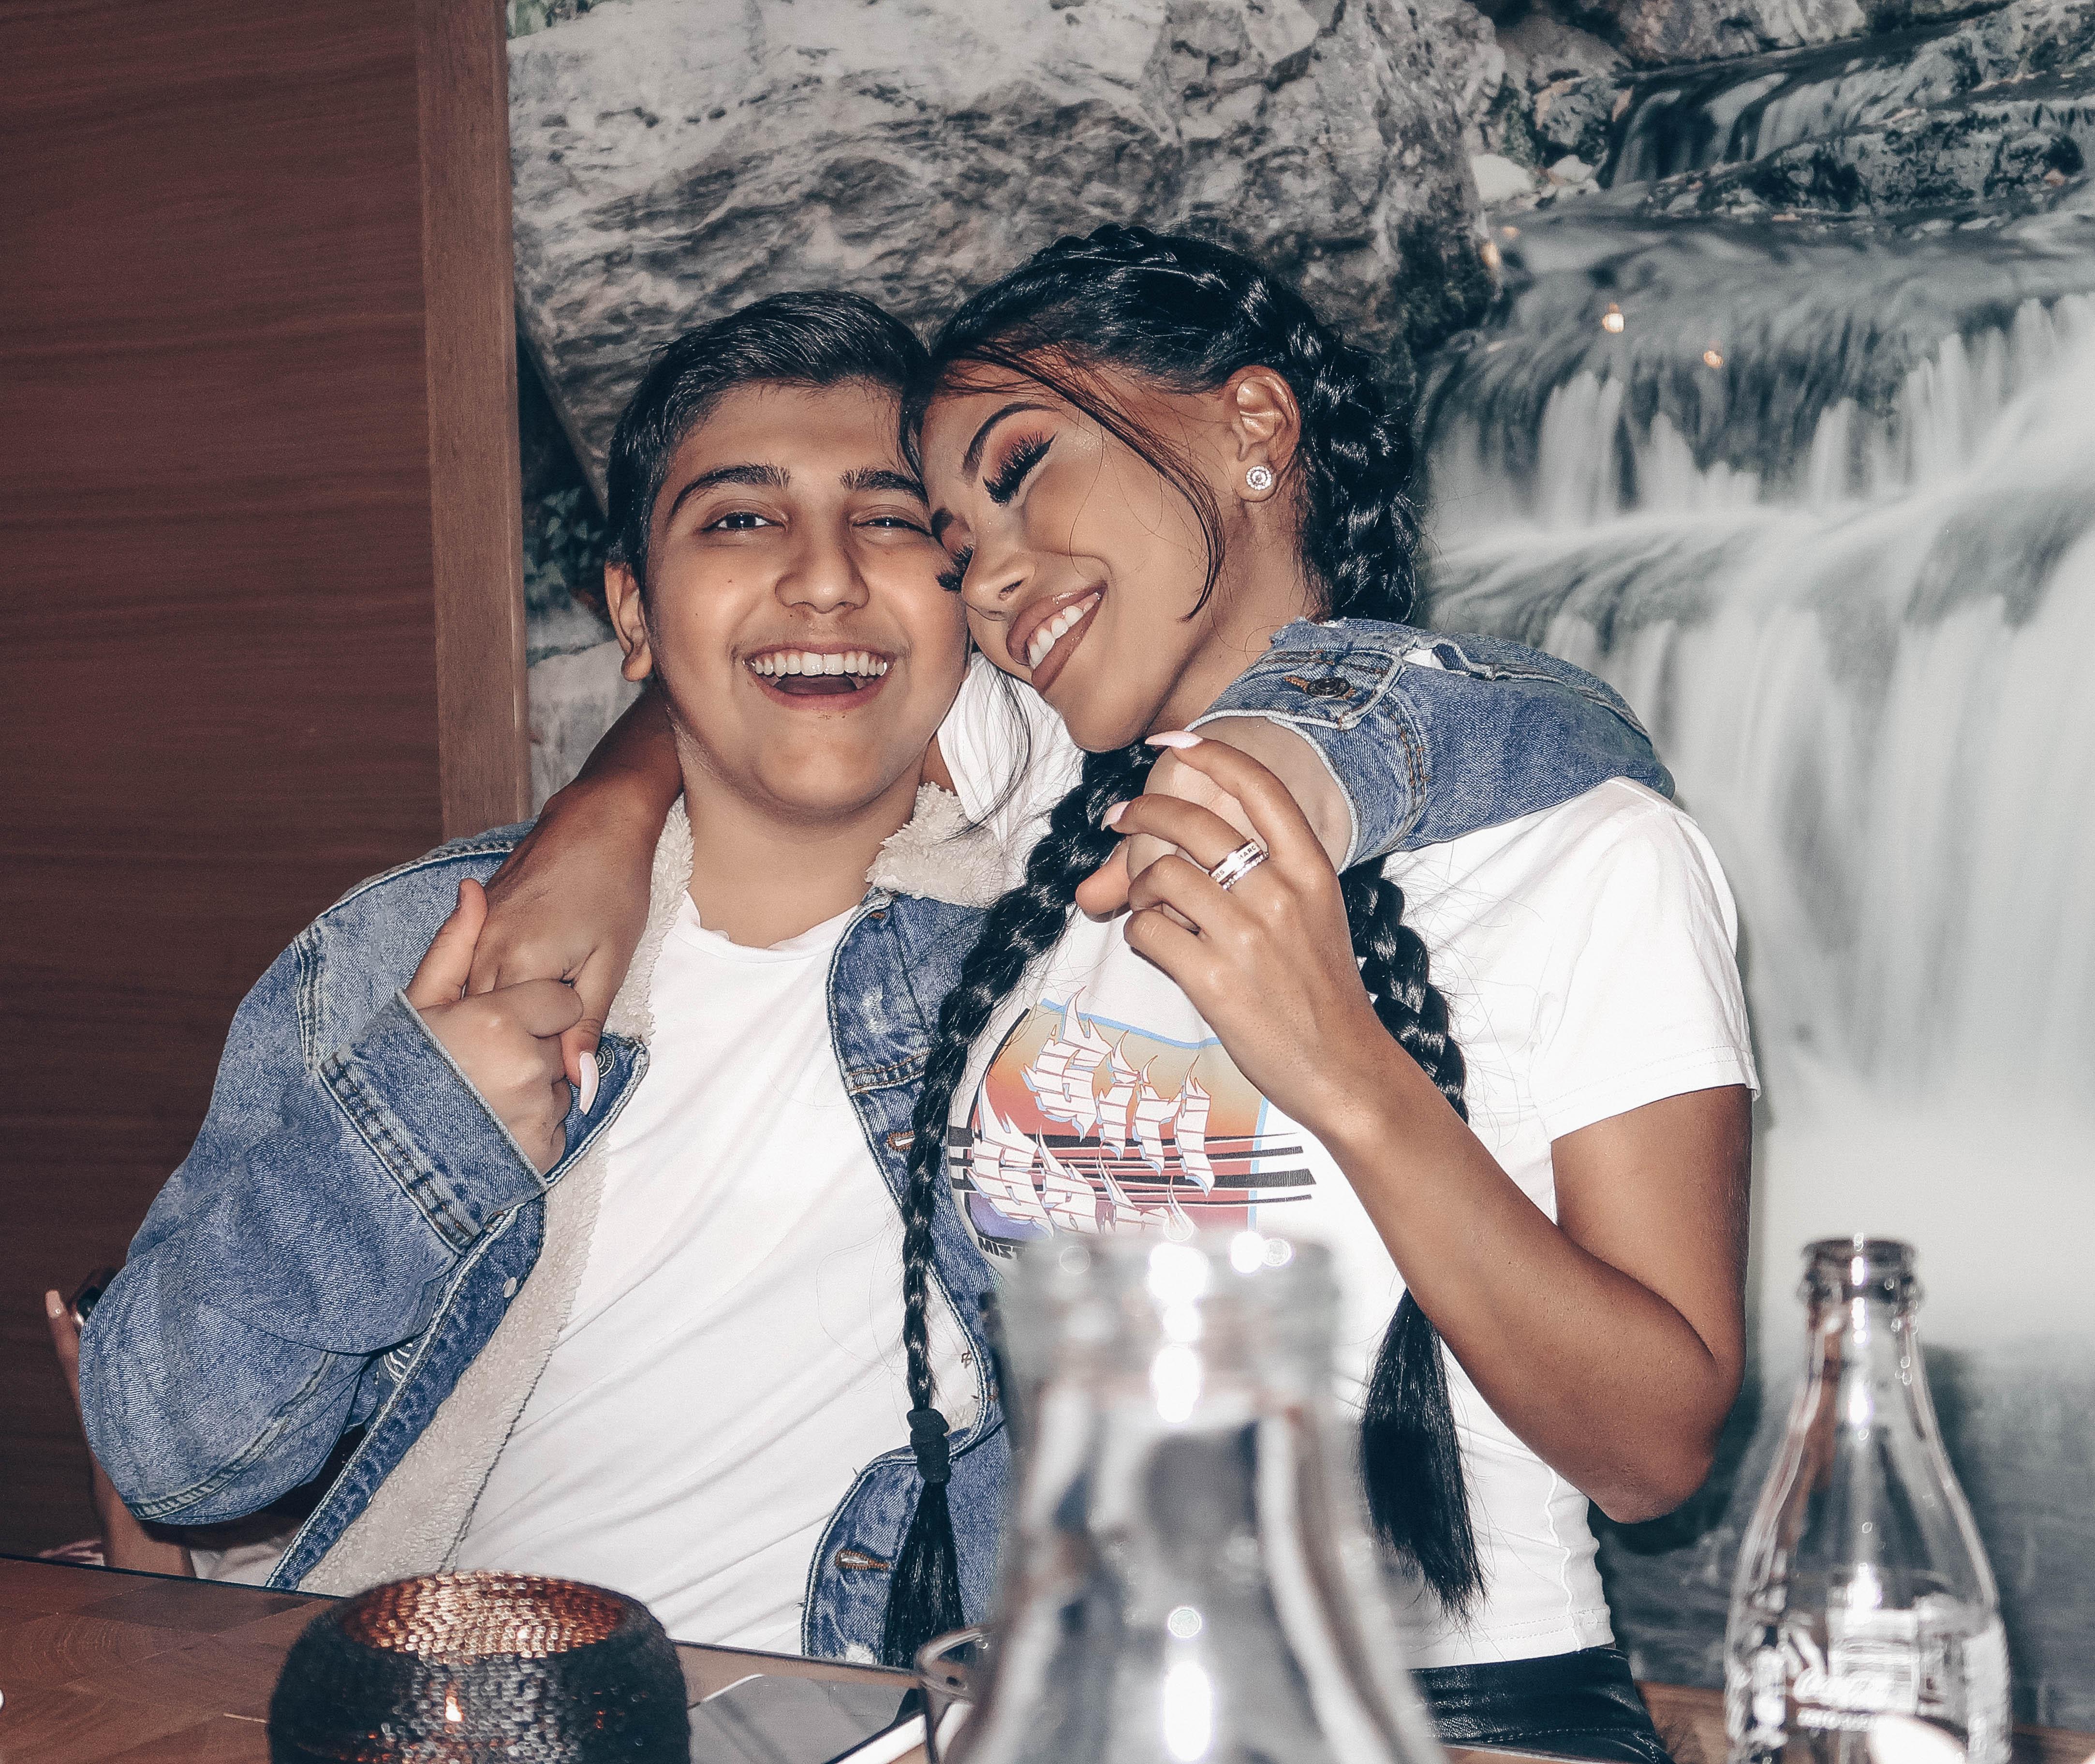 18 og 15 år gammel dating juridisk innsjø varva dating